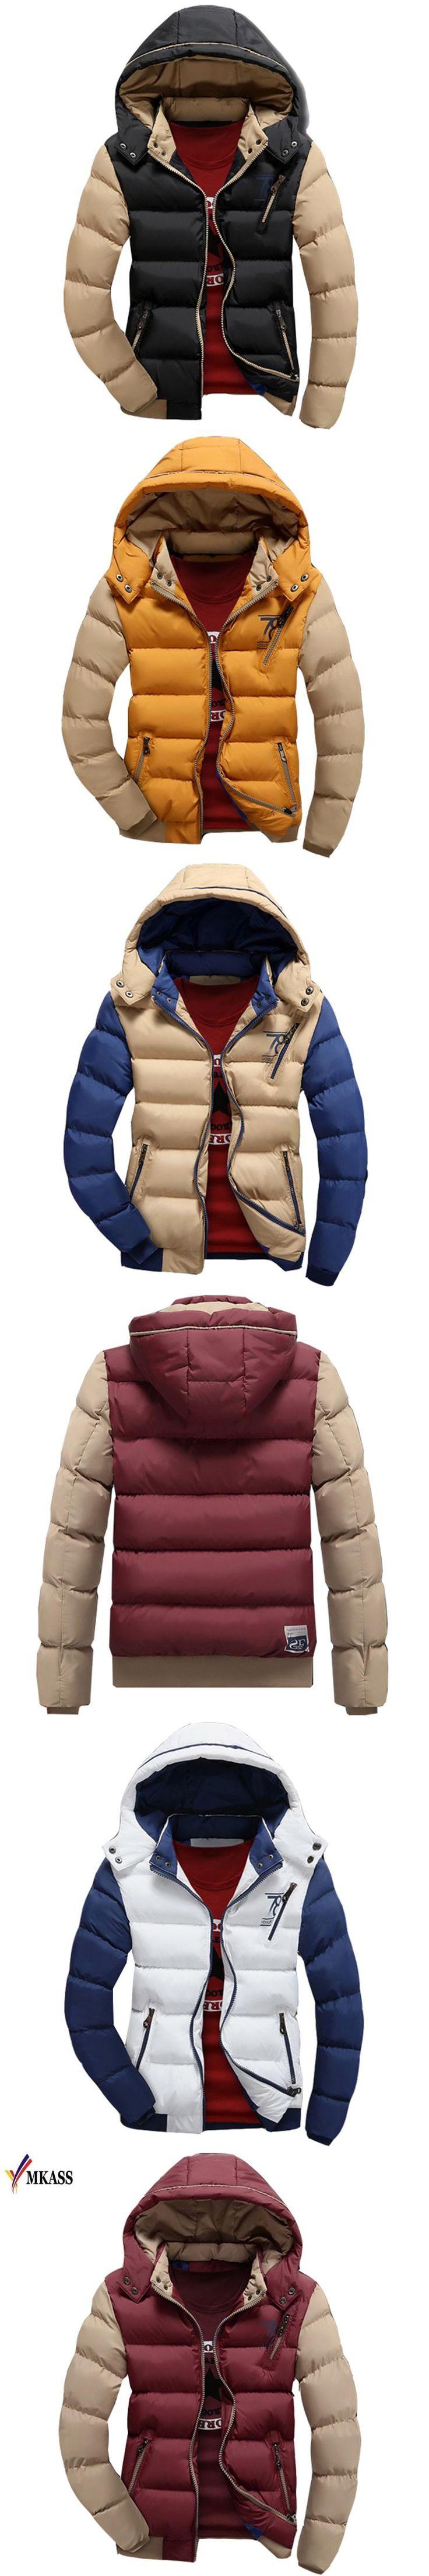 Hot Sale Winter Jacket Men Warm Down Jacket Casual Parka Men Padded Winter Jacket Casual Handsome Winter Coat Men Size M-4XL